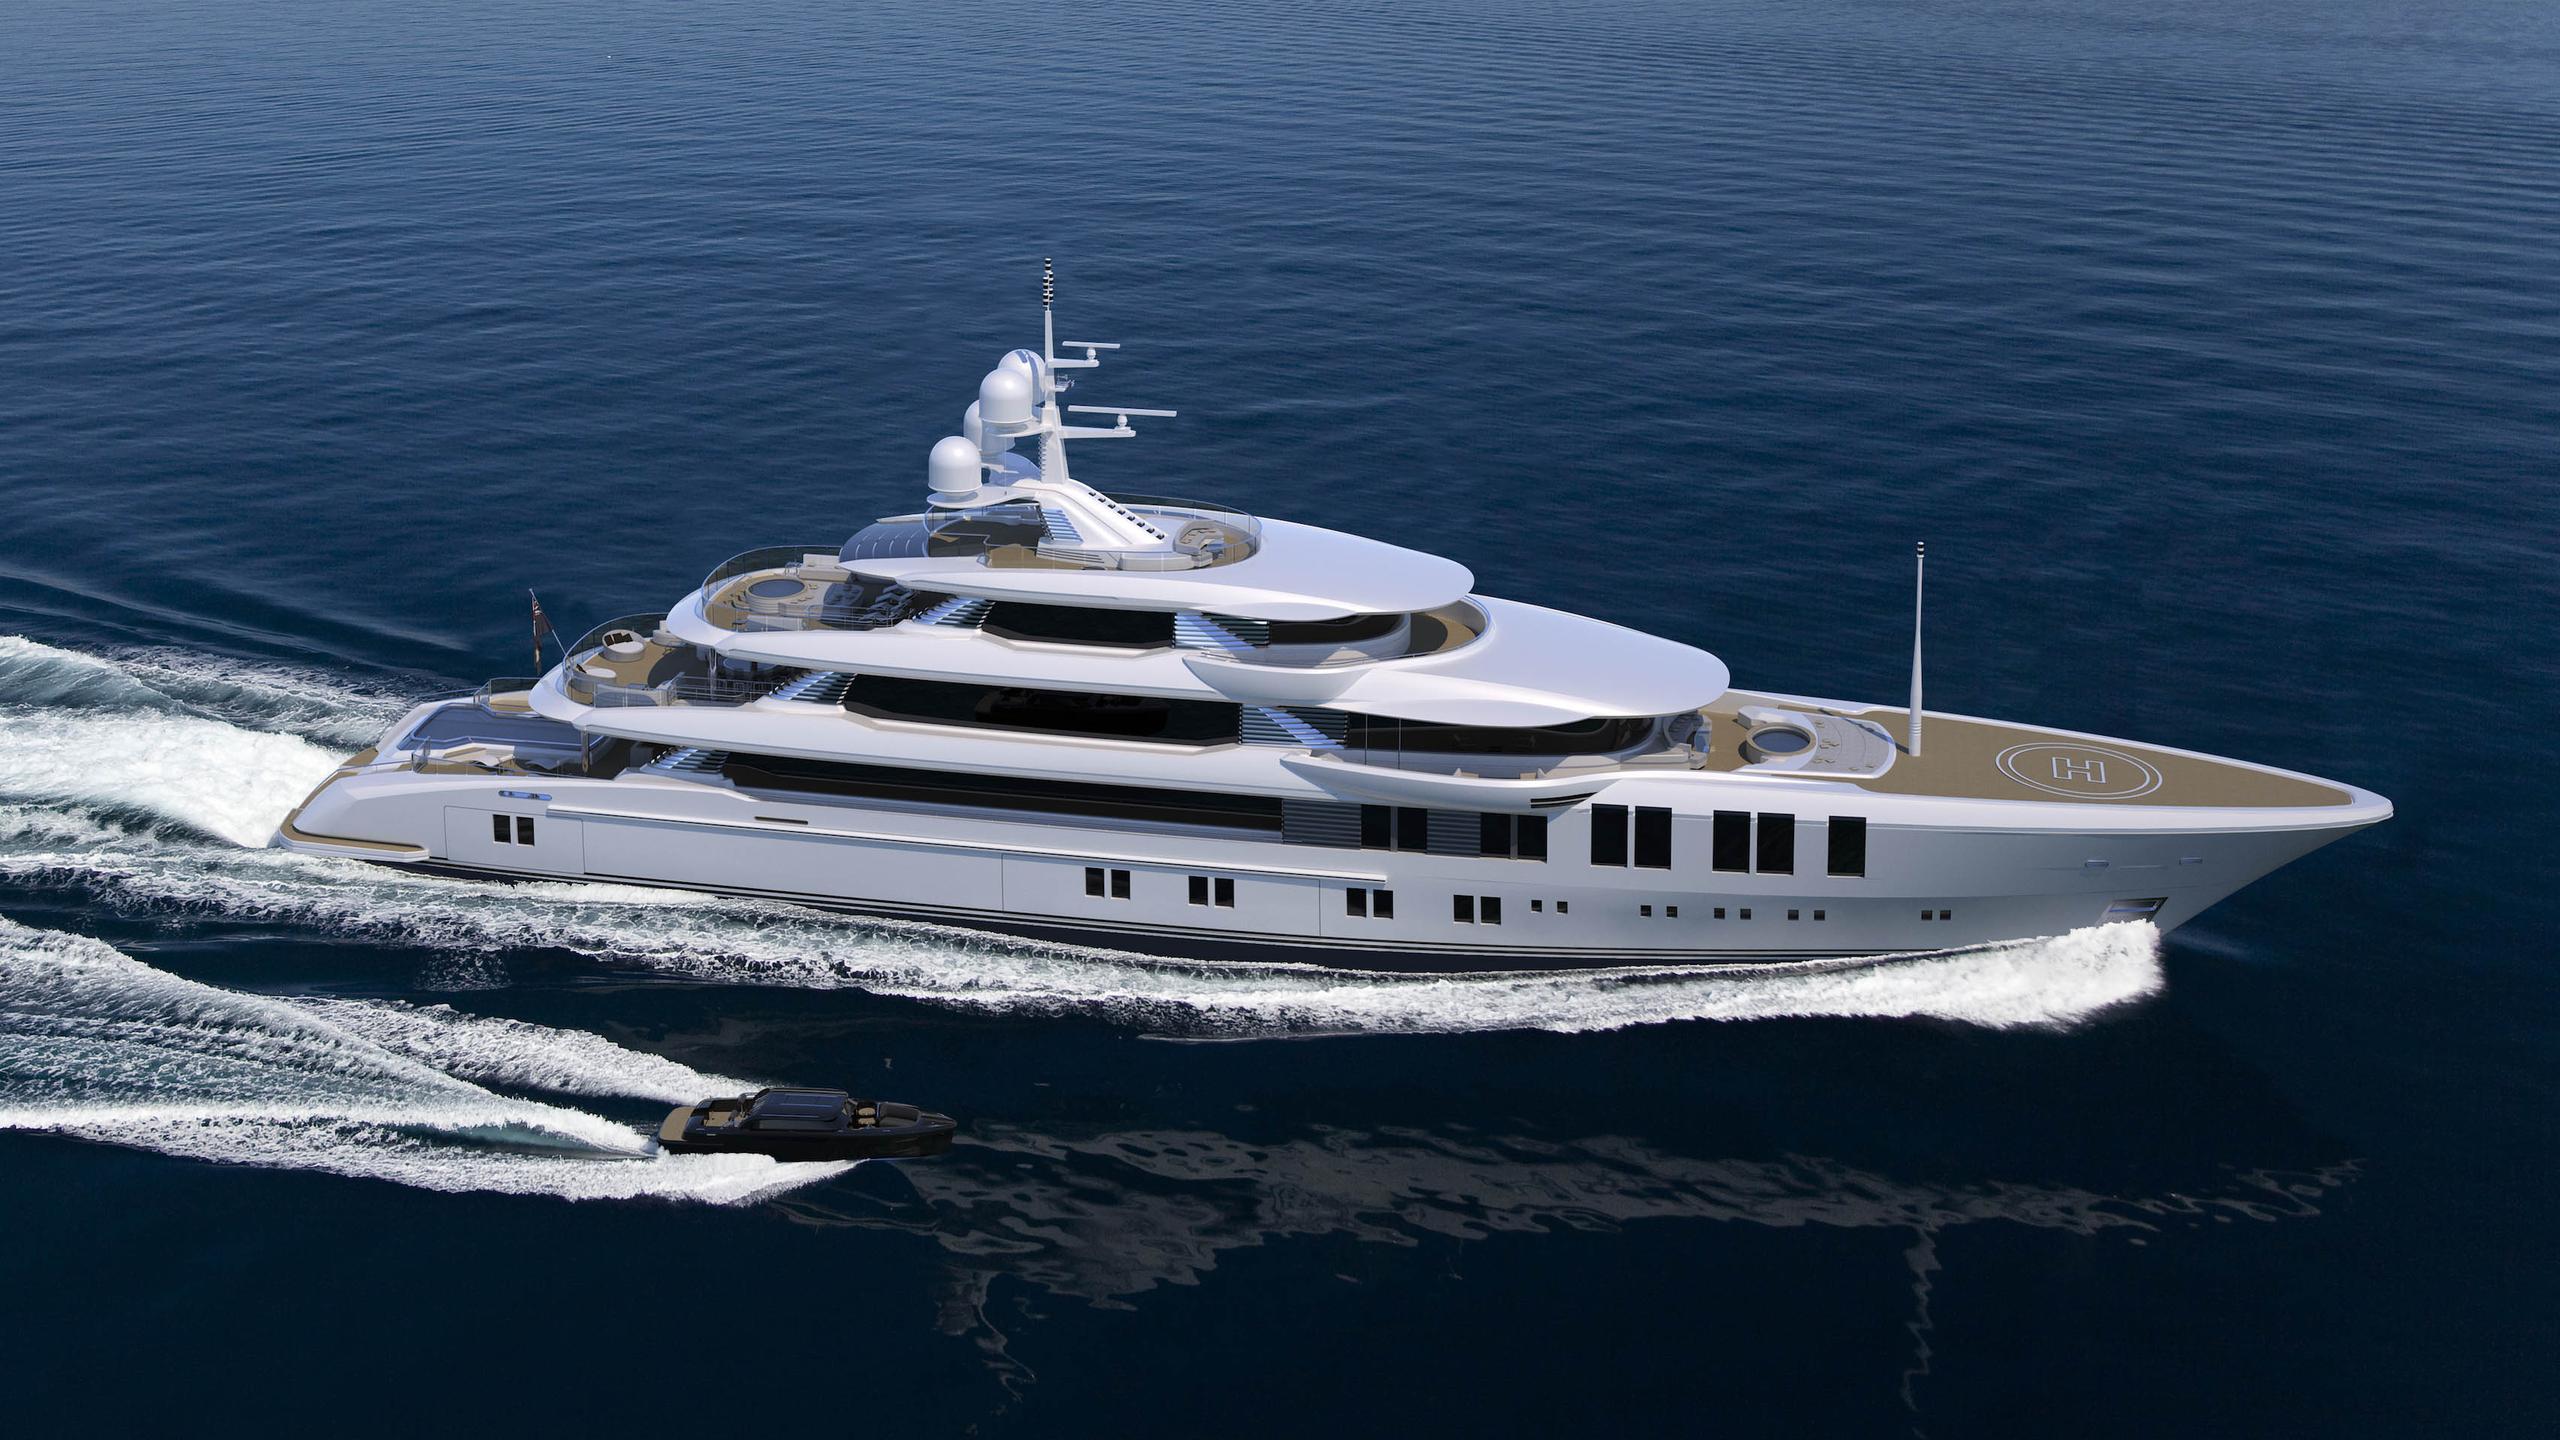 turquoise 74m motoryacht turquoise yachts 74m 2019 rendering